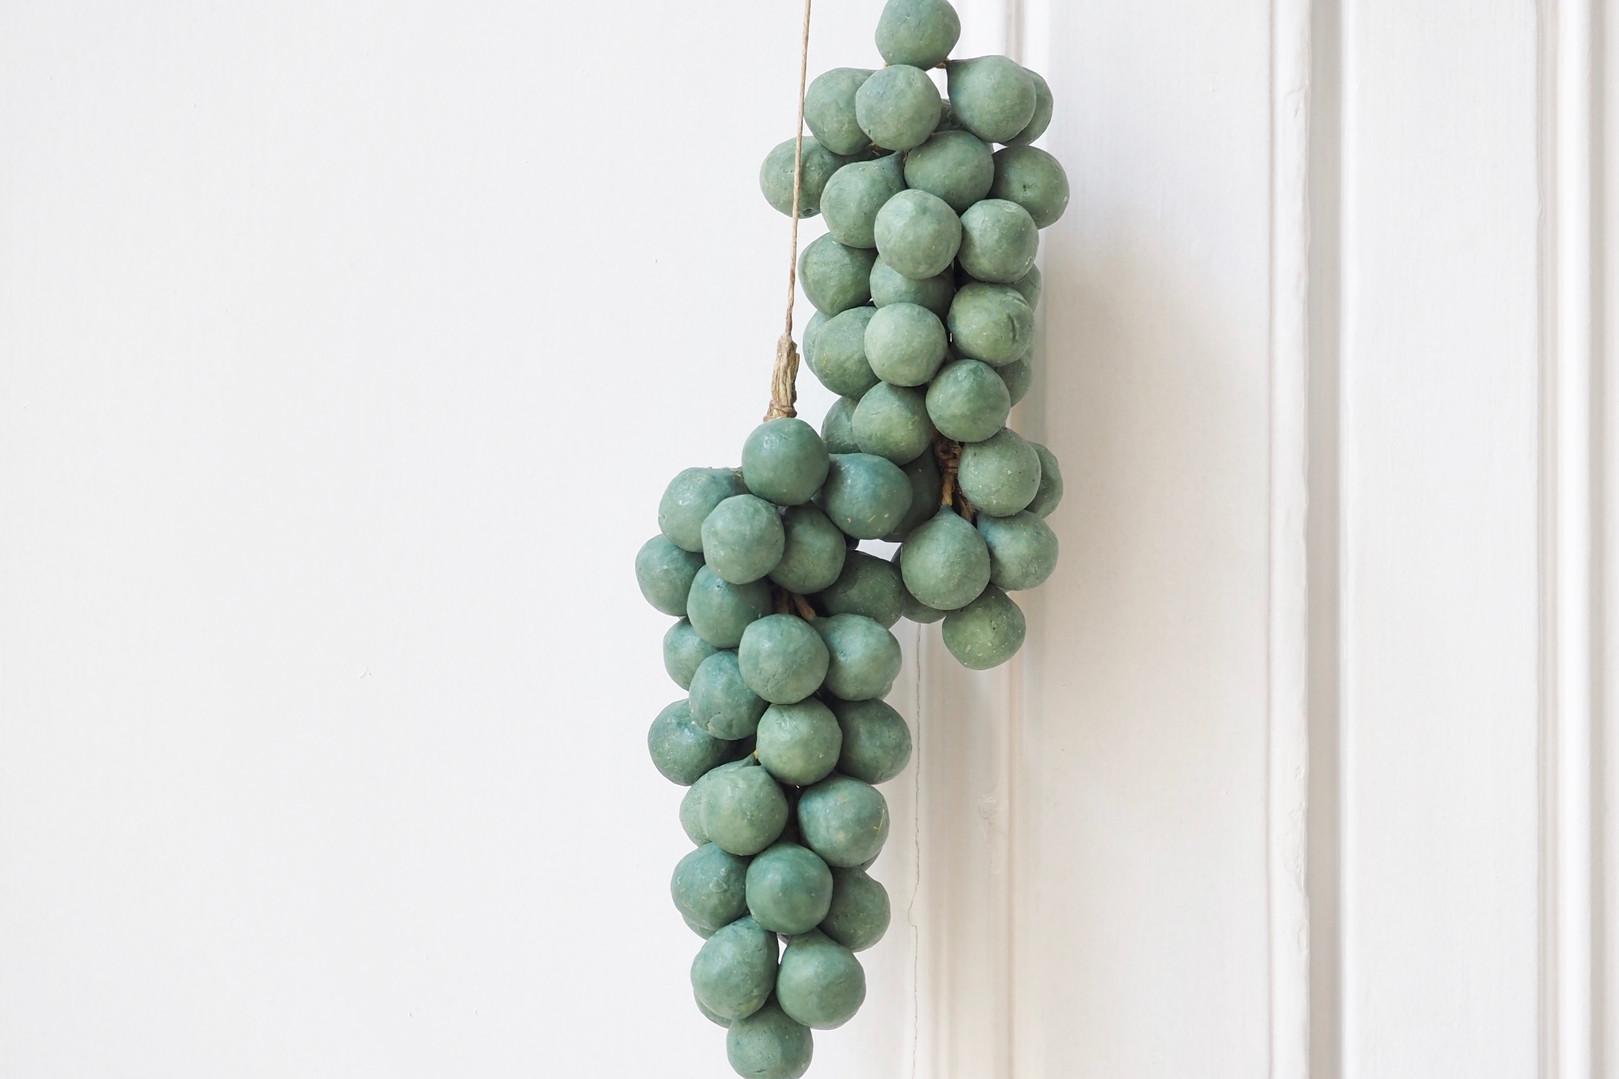 grappe-savon-liban-huile-olive.jpg